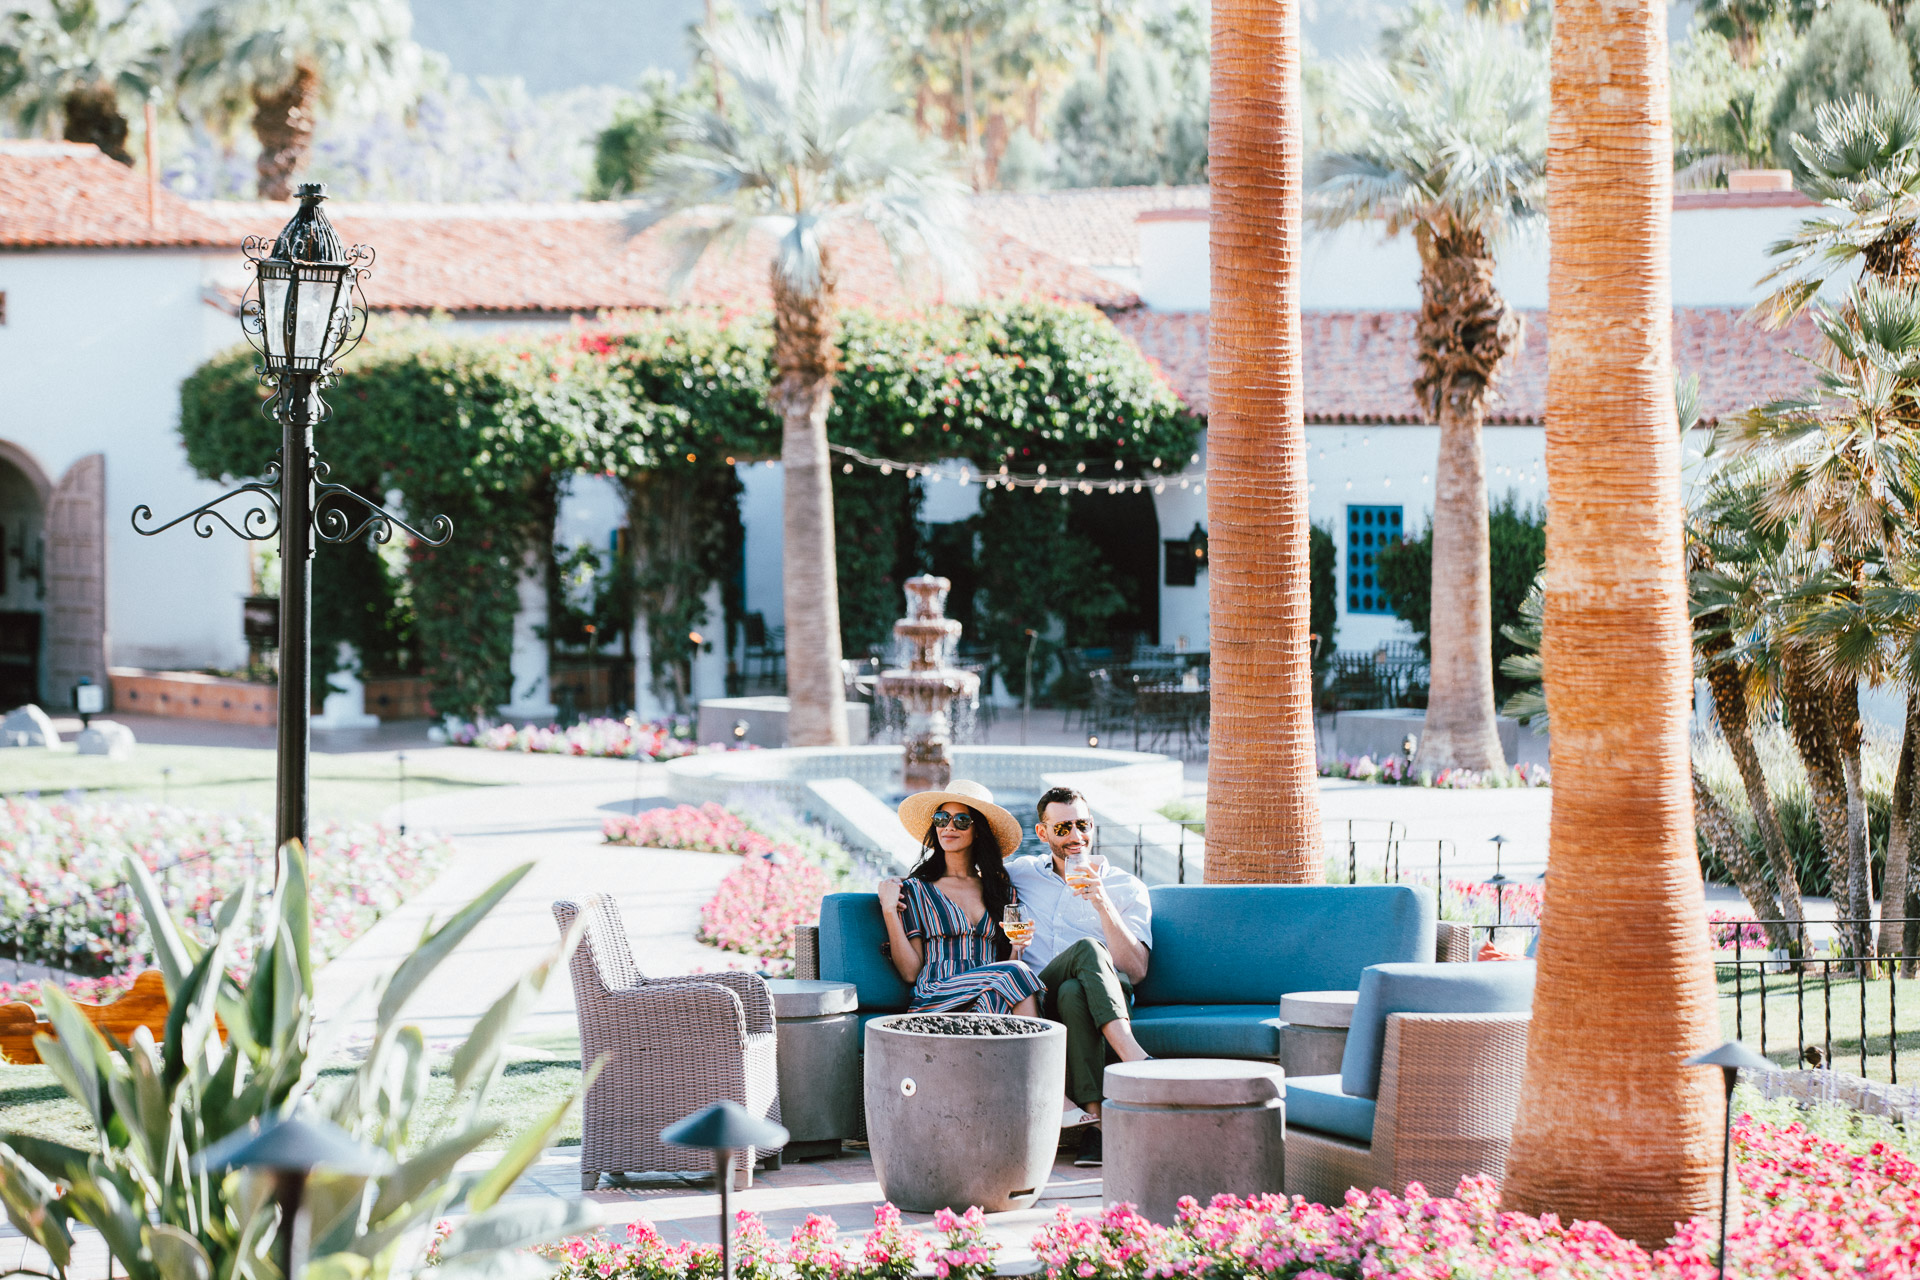 palm-springs-california-hotel-lifestyle-photographer-la-quinta-resort-club-26.jpg